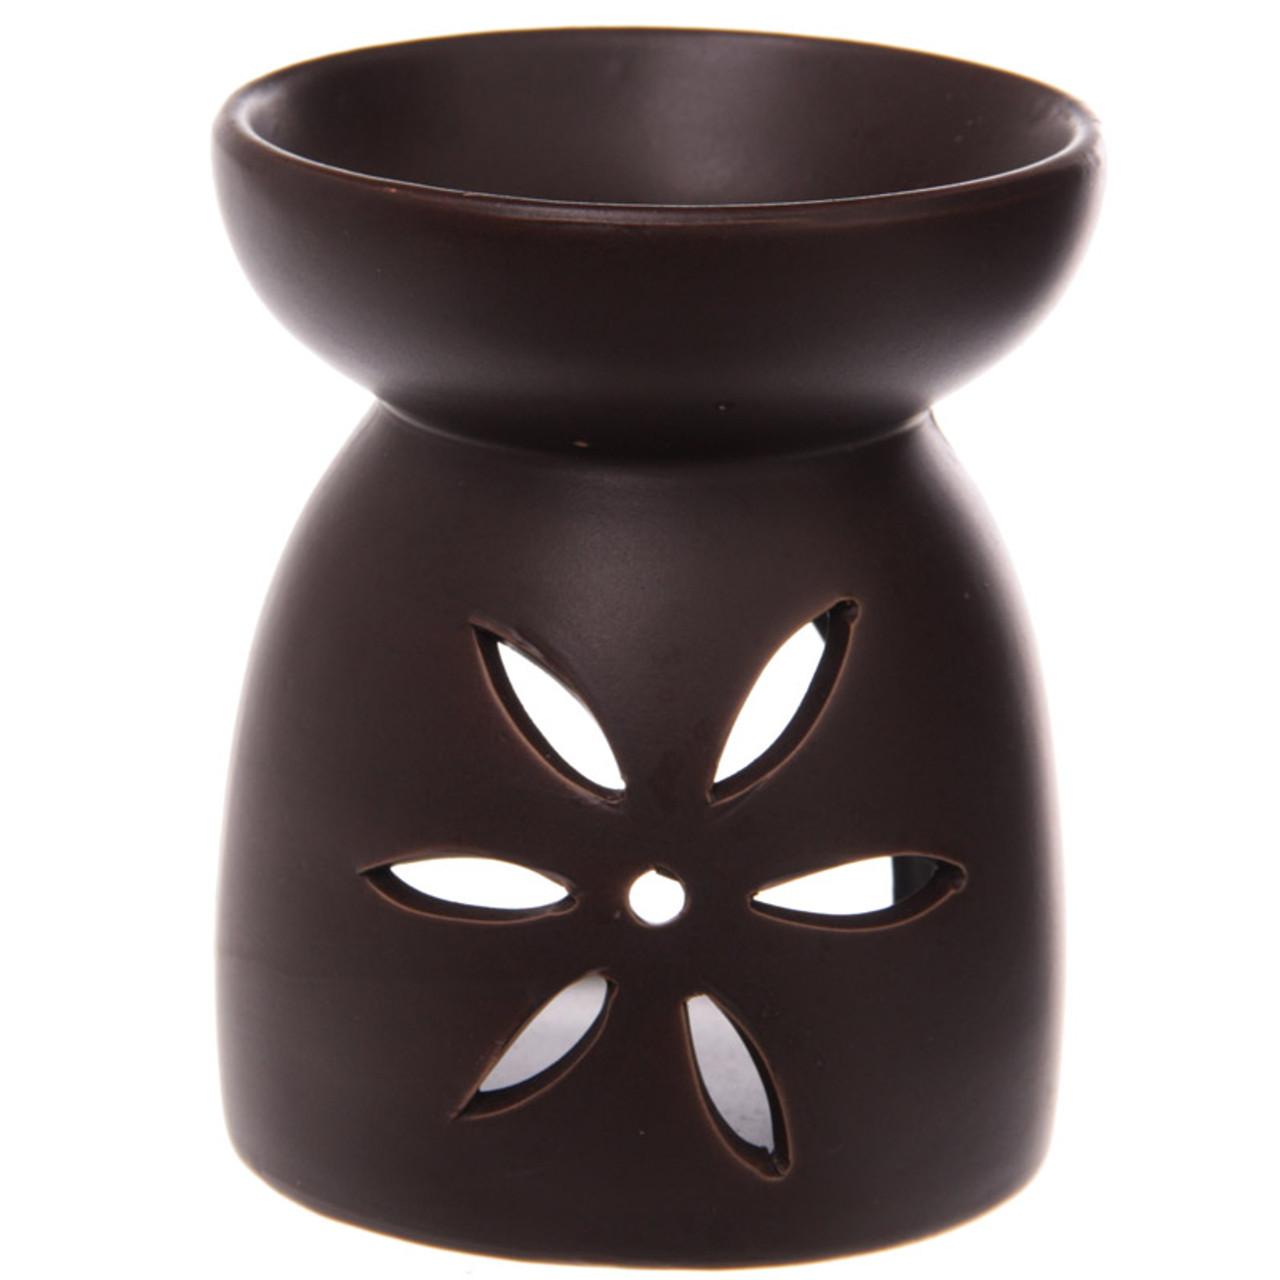 Large Ceramic Premium Oil Burner With Flower Fretwork